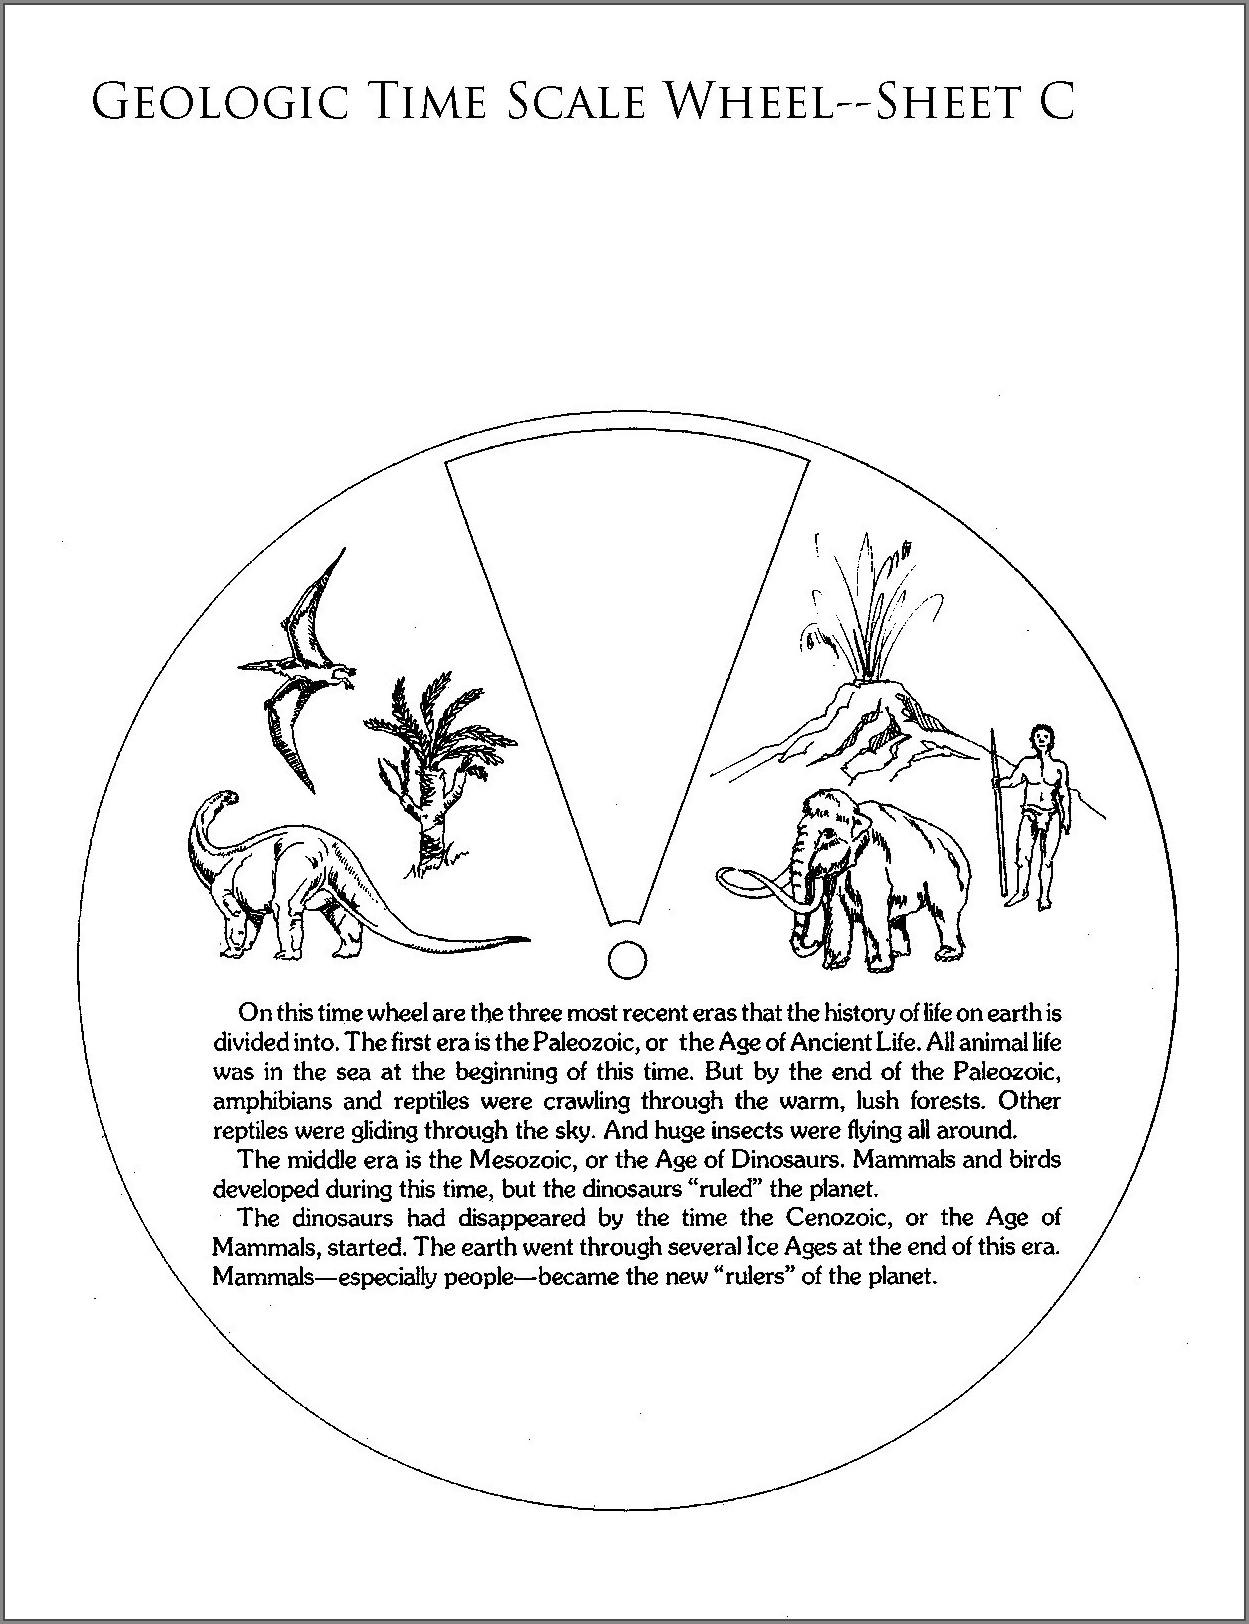 Plate Tectonics Vocabulary Worksheet